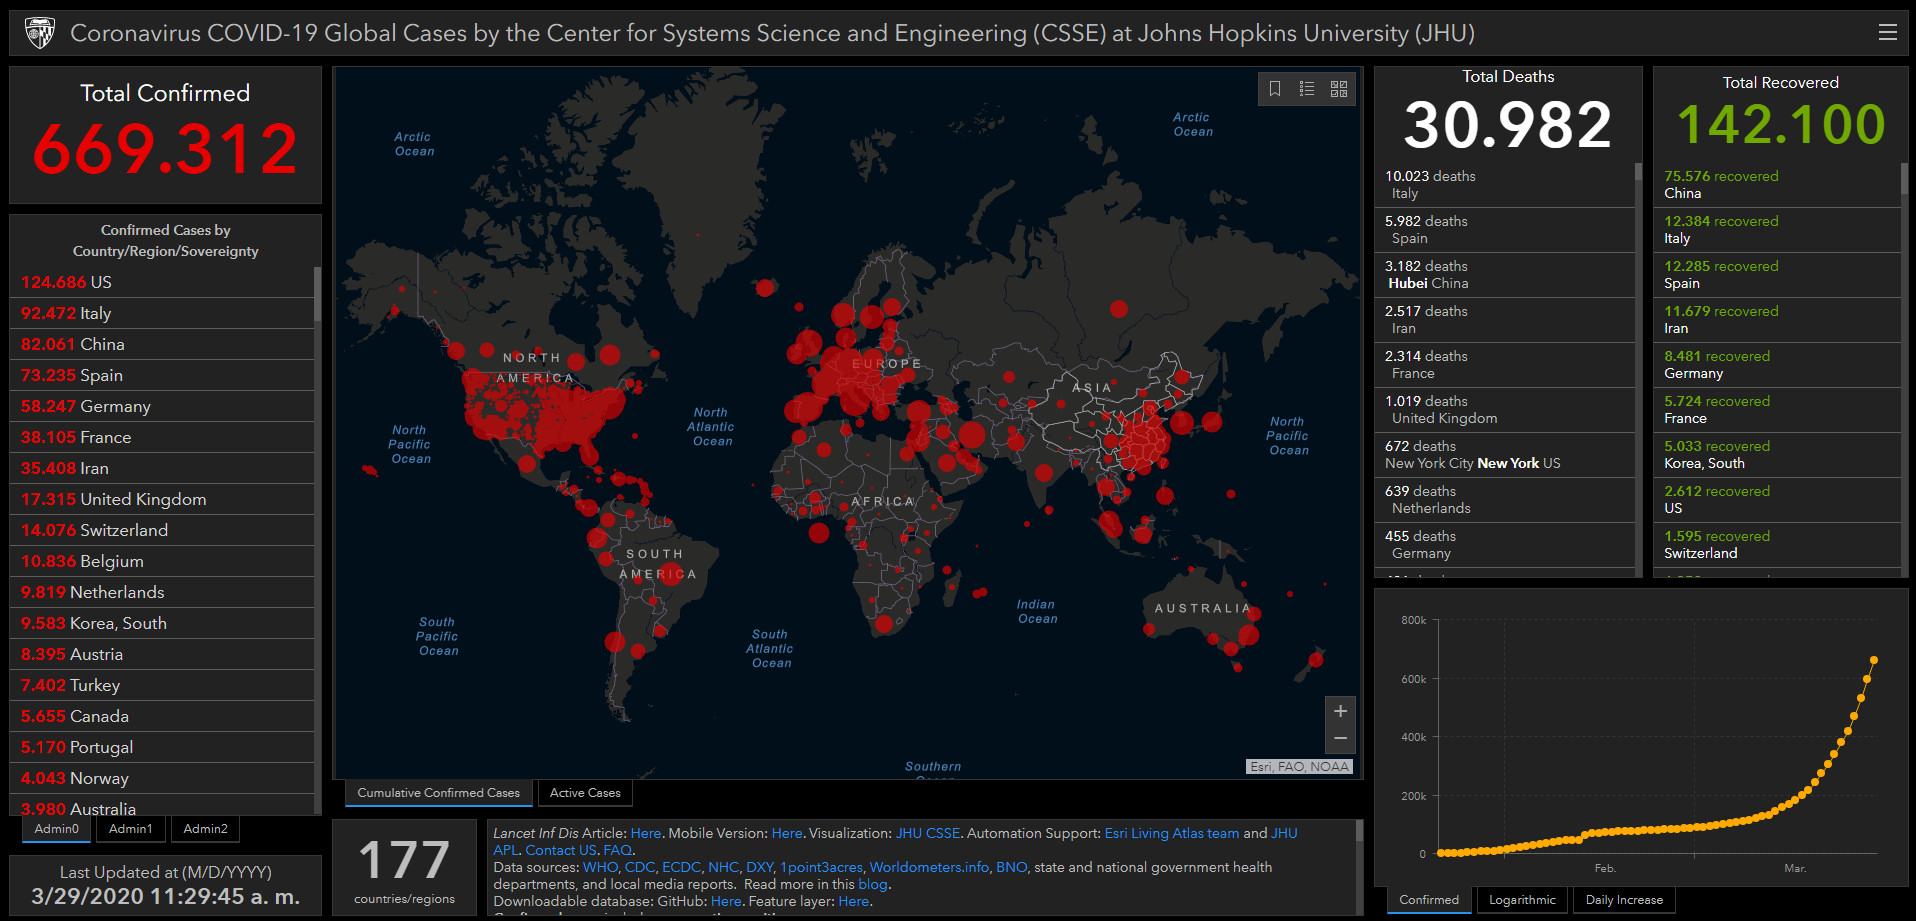 coronavirus covid-19 estadisticas globales mapa 29 marzo 2020